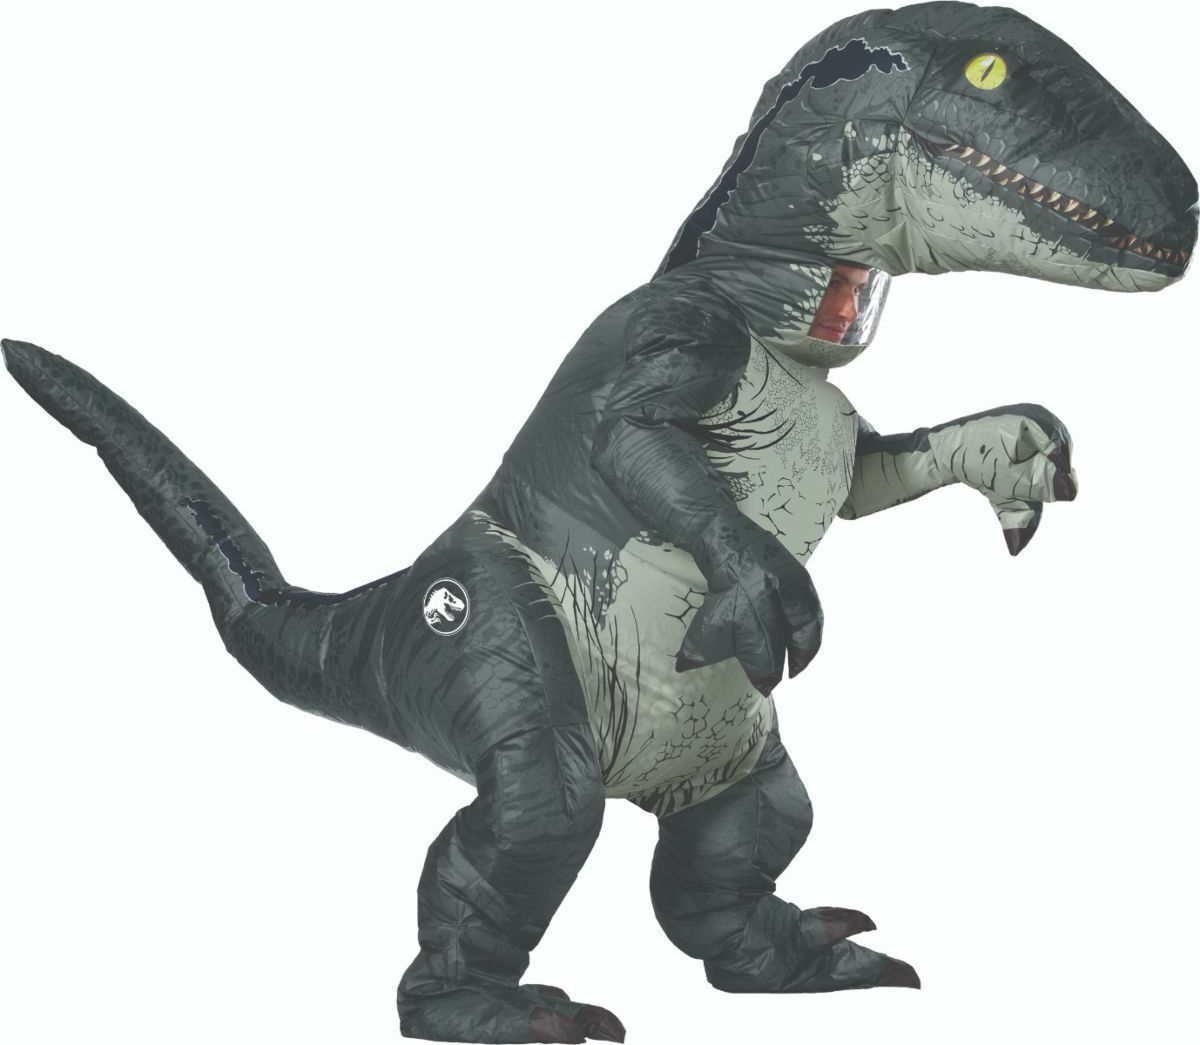 Rubini Jurassic World Velociraptor Gonfiabile Adulto Costume Halloween 820883 image 2